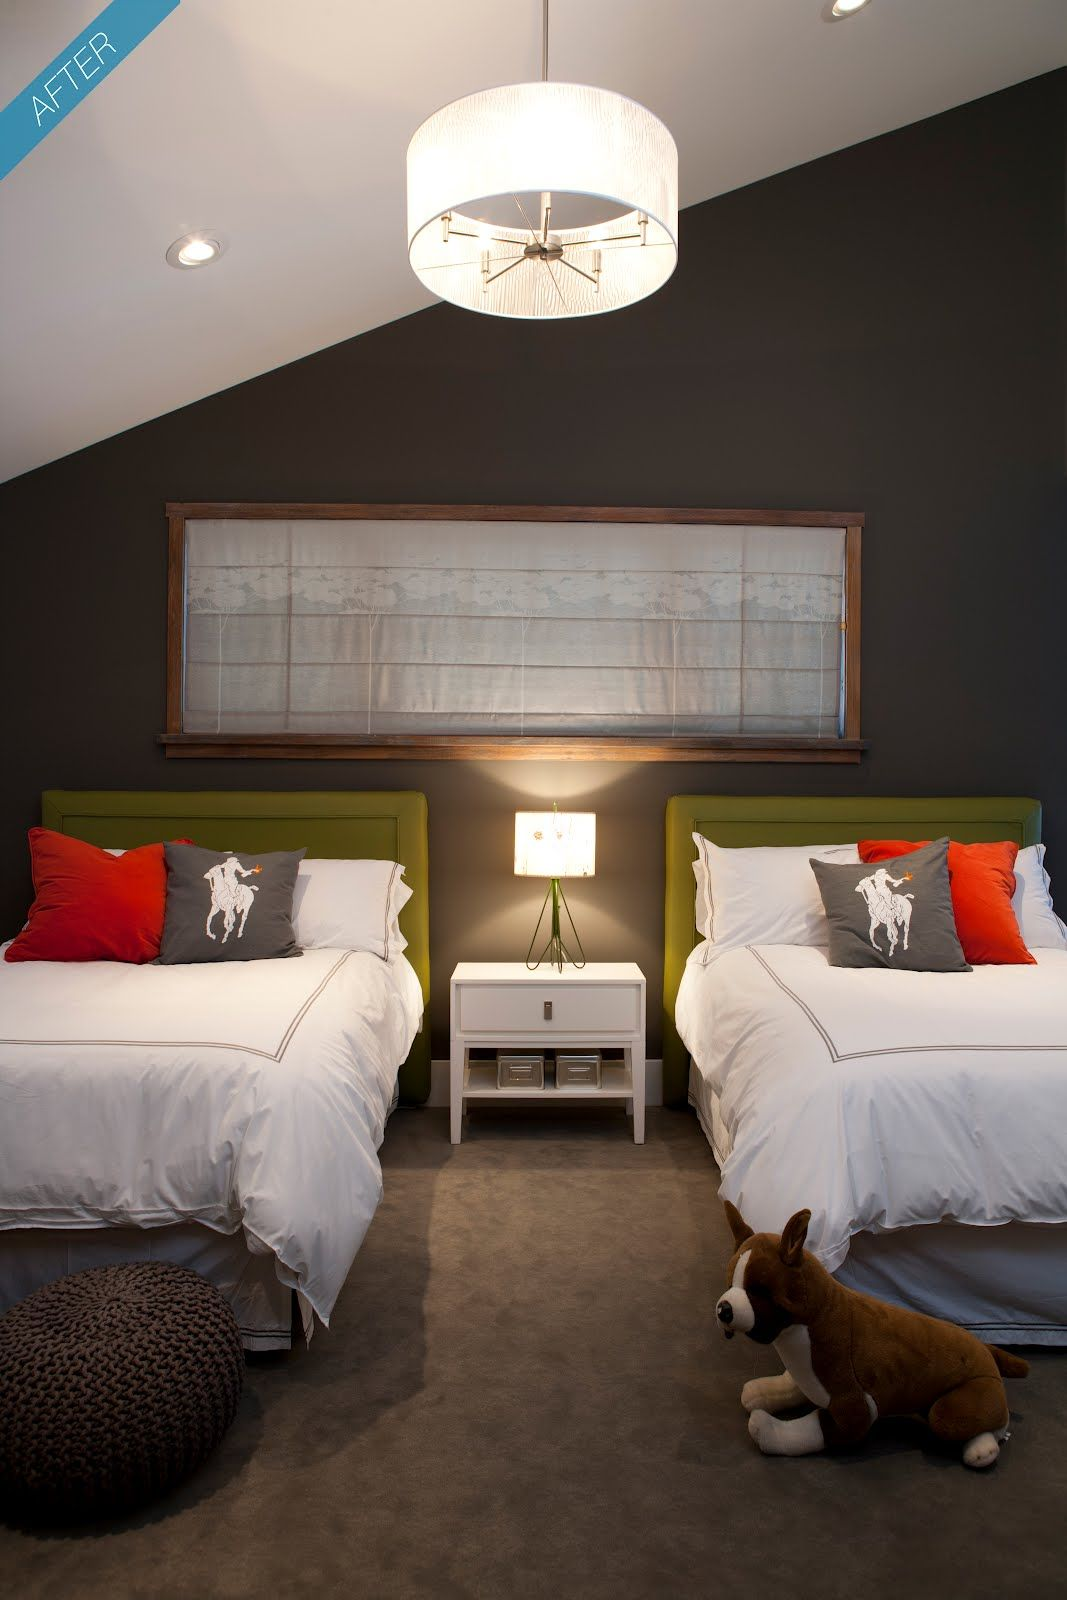 Master bedroom green paint ideas  raenovate boyus bedroom before  after  the boyz room  Pinterest